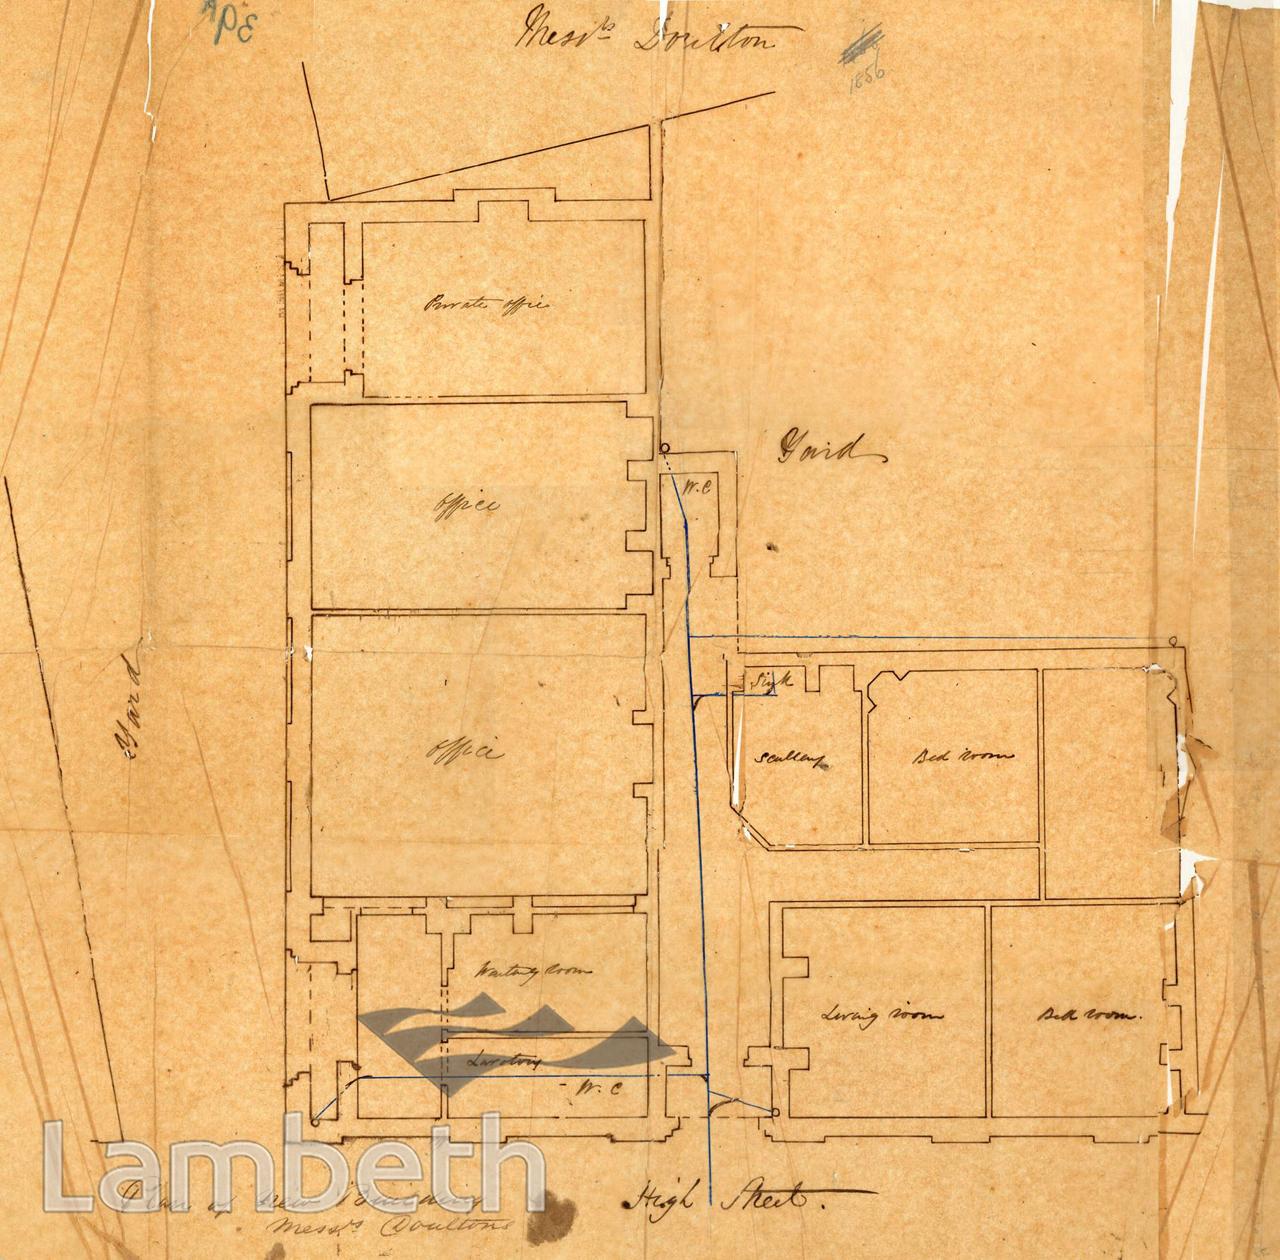 DOULTON BUILDING PLAN, HIGH STREET, LAMBETH